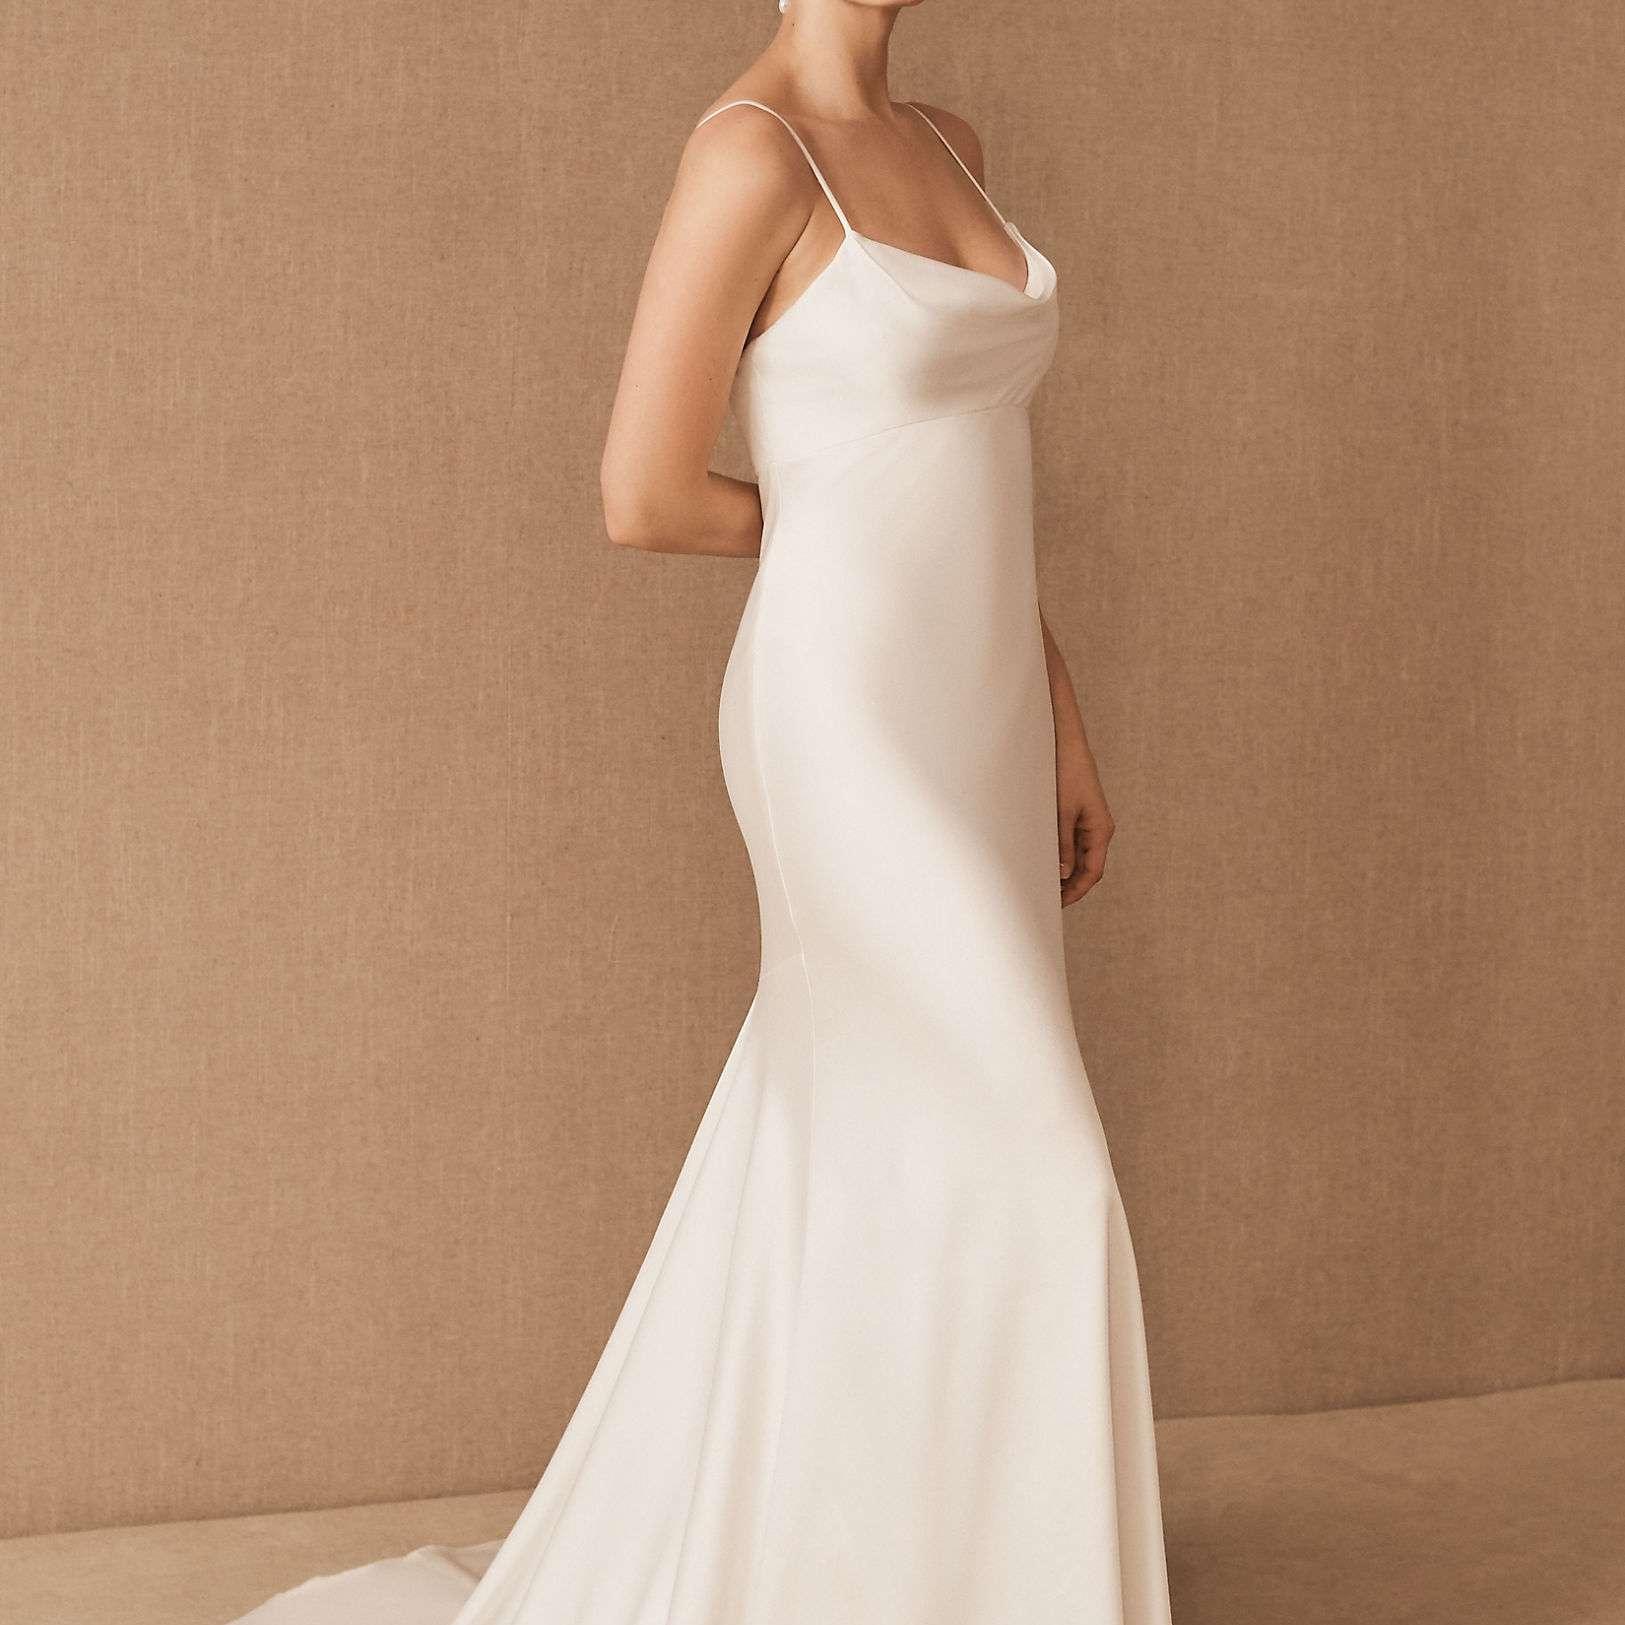 The 29 Best Simple Wedding Dresses Of 2020,Stunning Wedding Guest Dresses Uk